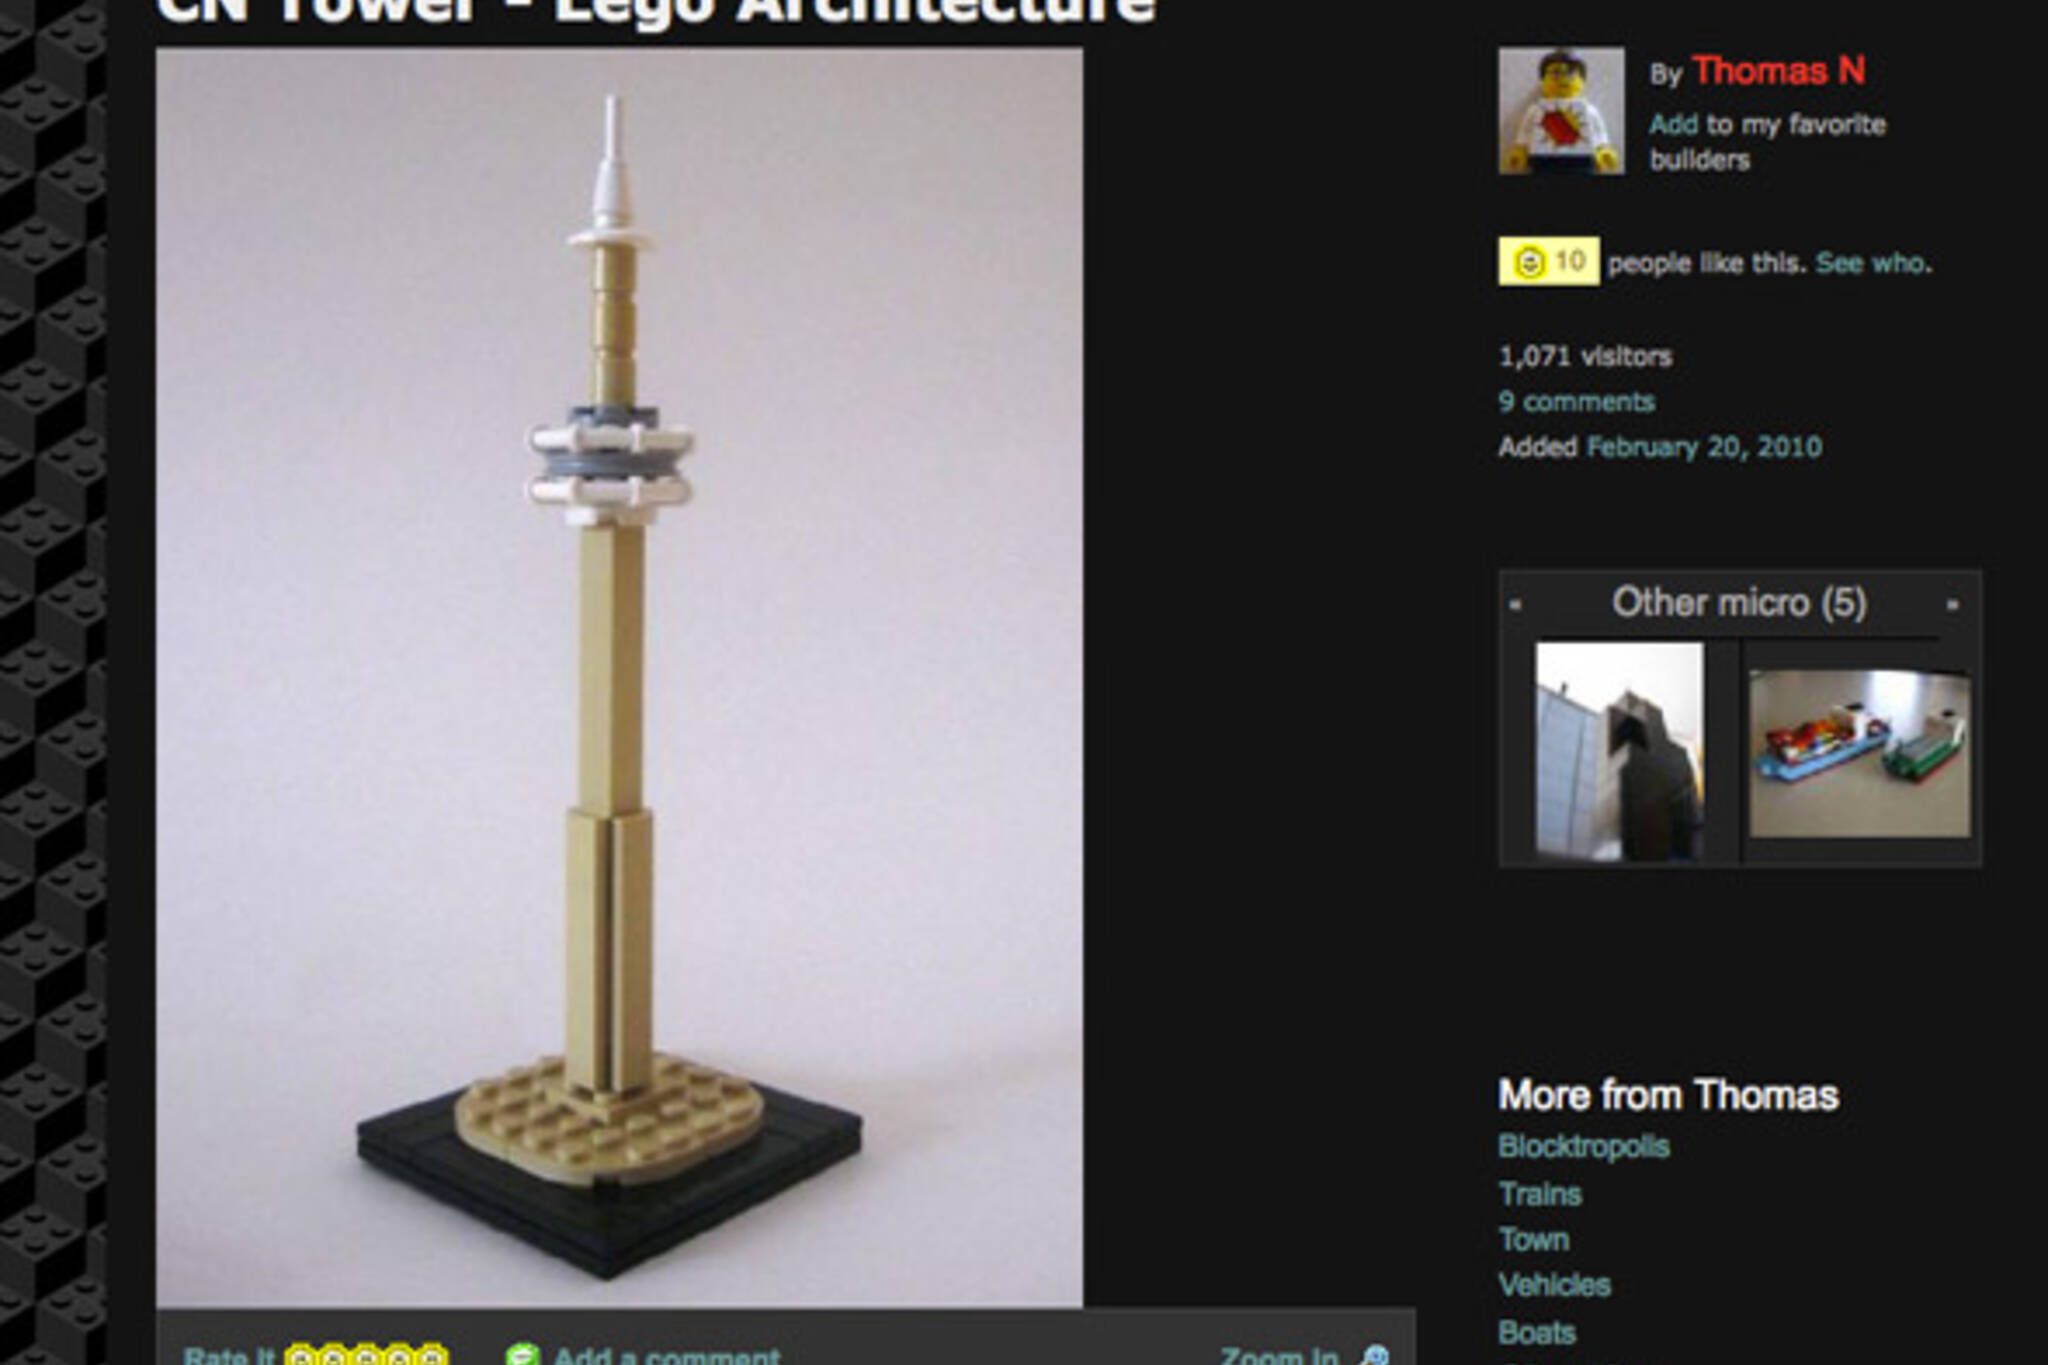 CN Tower Lego